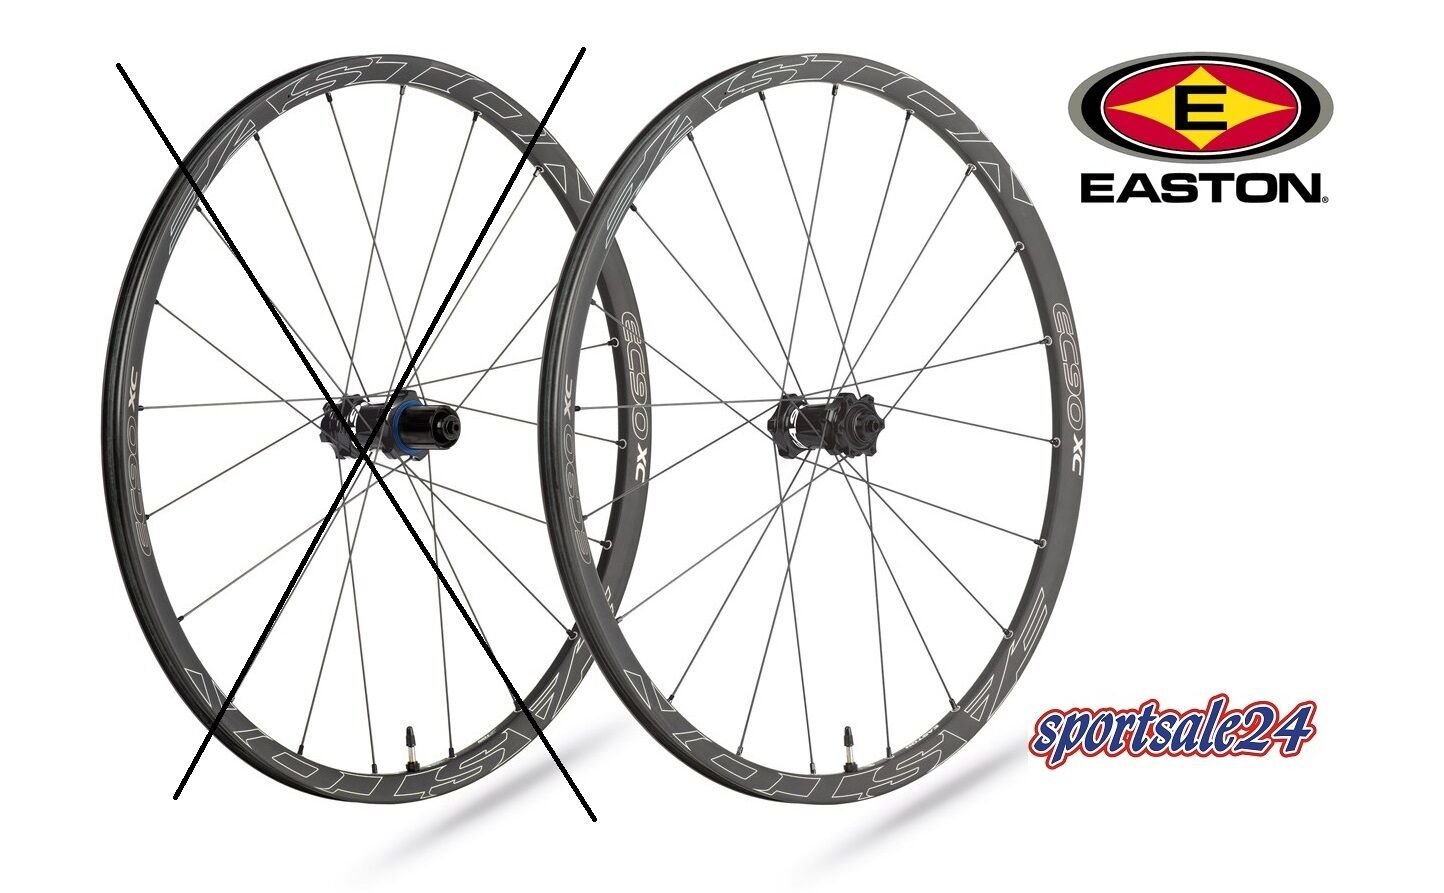 EASTON EC90 XC Karbon Vorderrad 26  9x100 NEU SONDERPREIS UVP